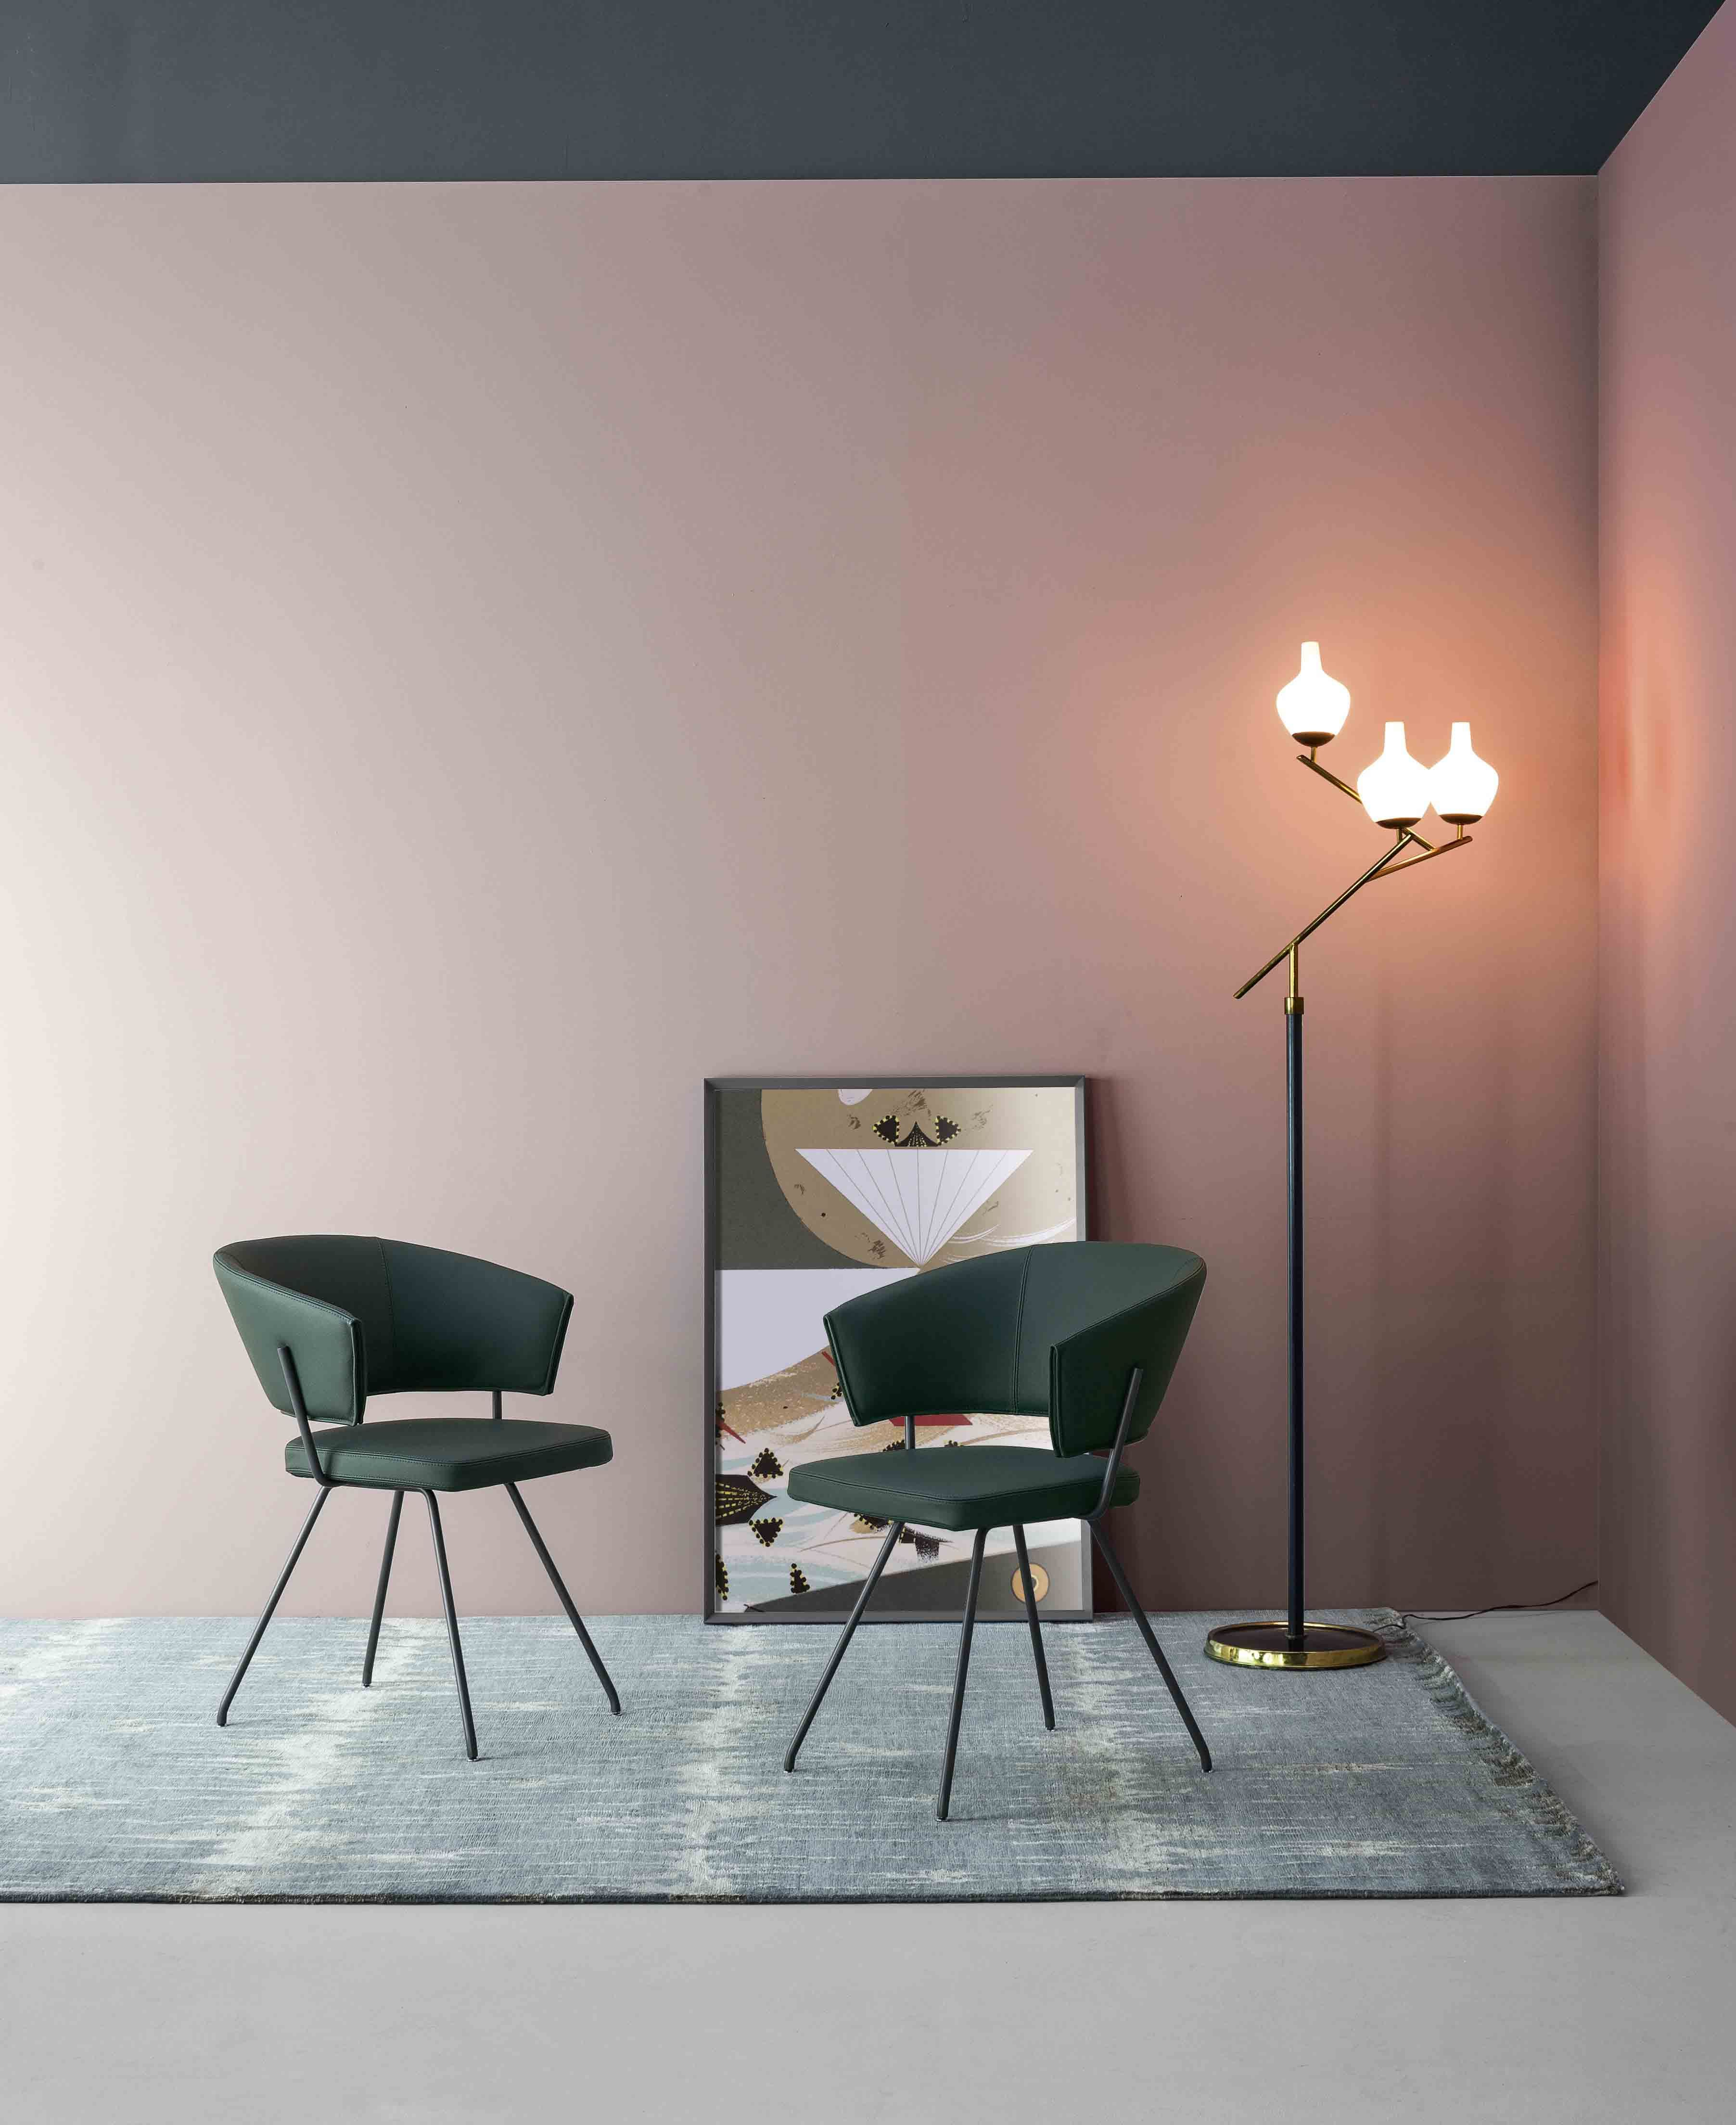 Bahia by Bonaldo Mauro Lipparini design Salone